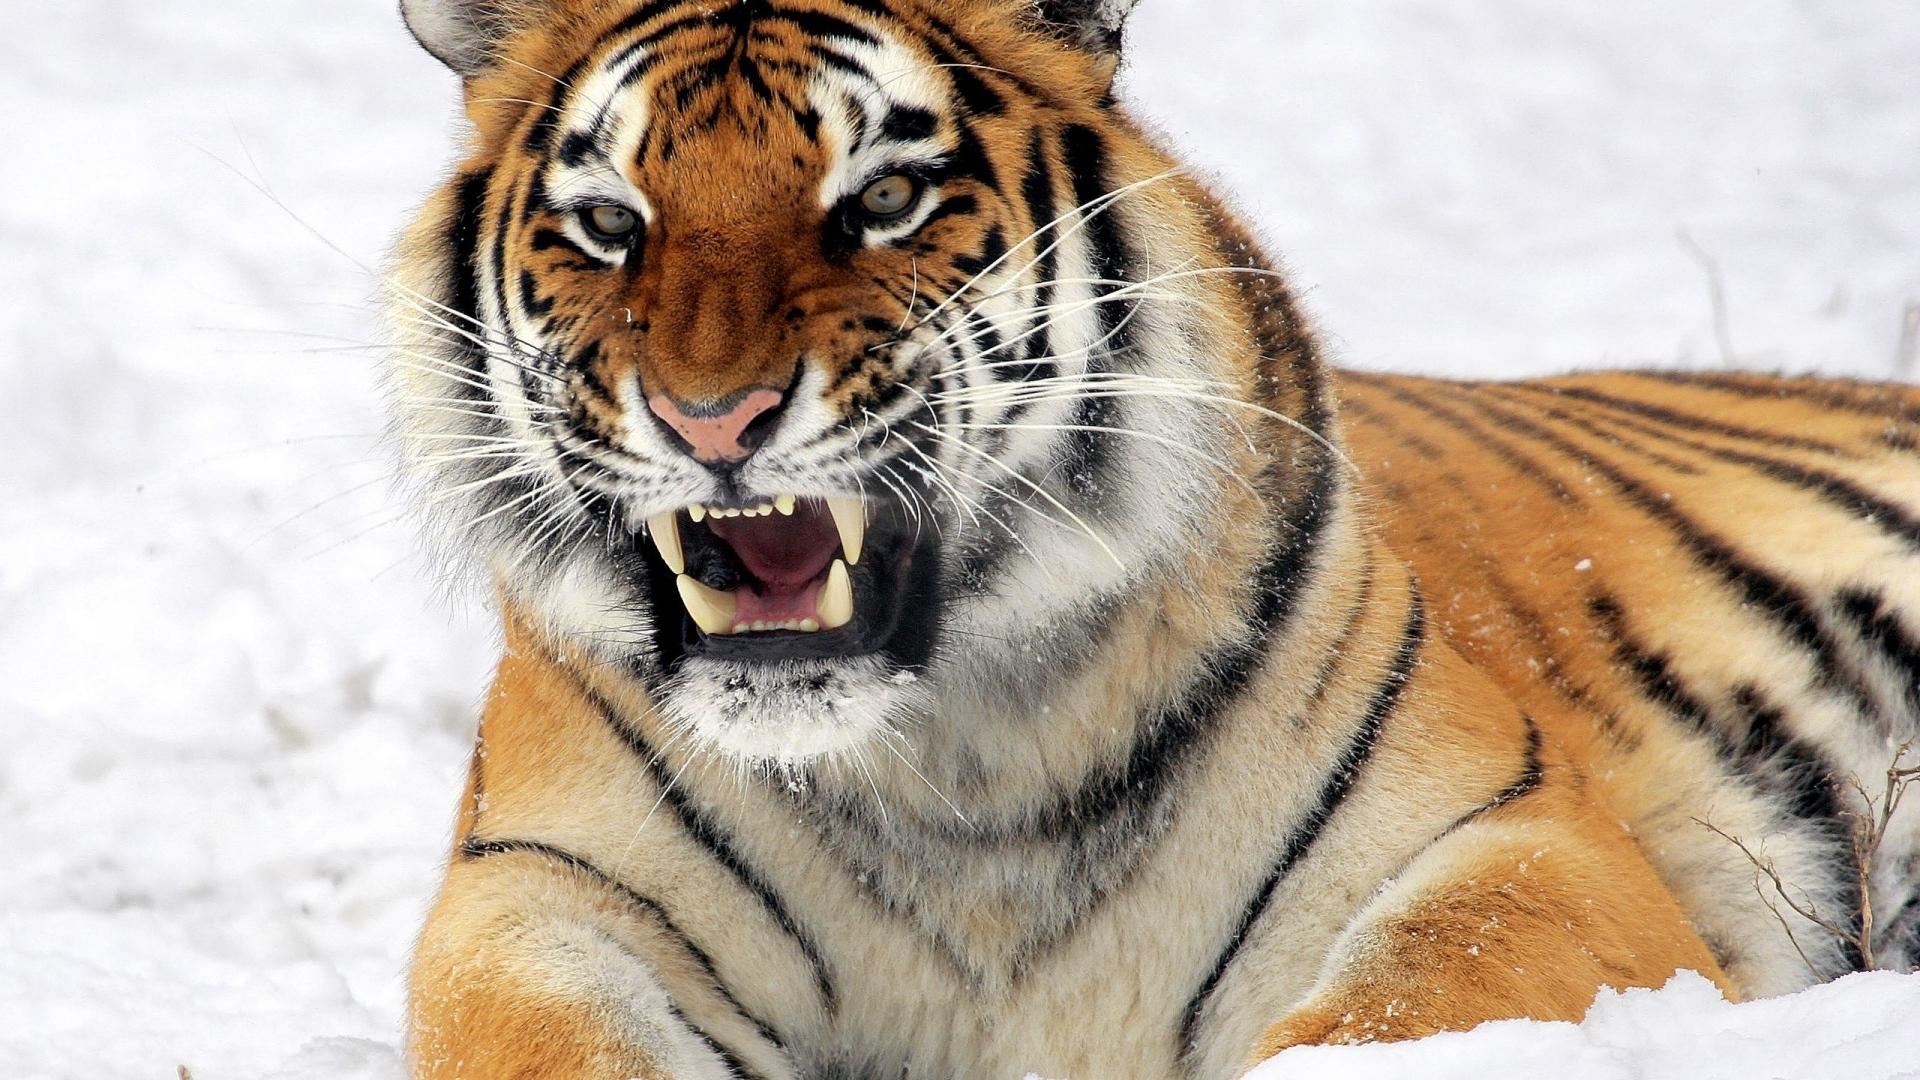 10 new siberian tiger wallpaper hd 1080p full hd 1080p for pc